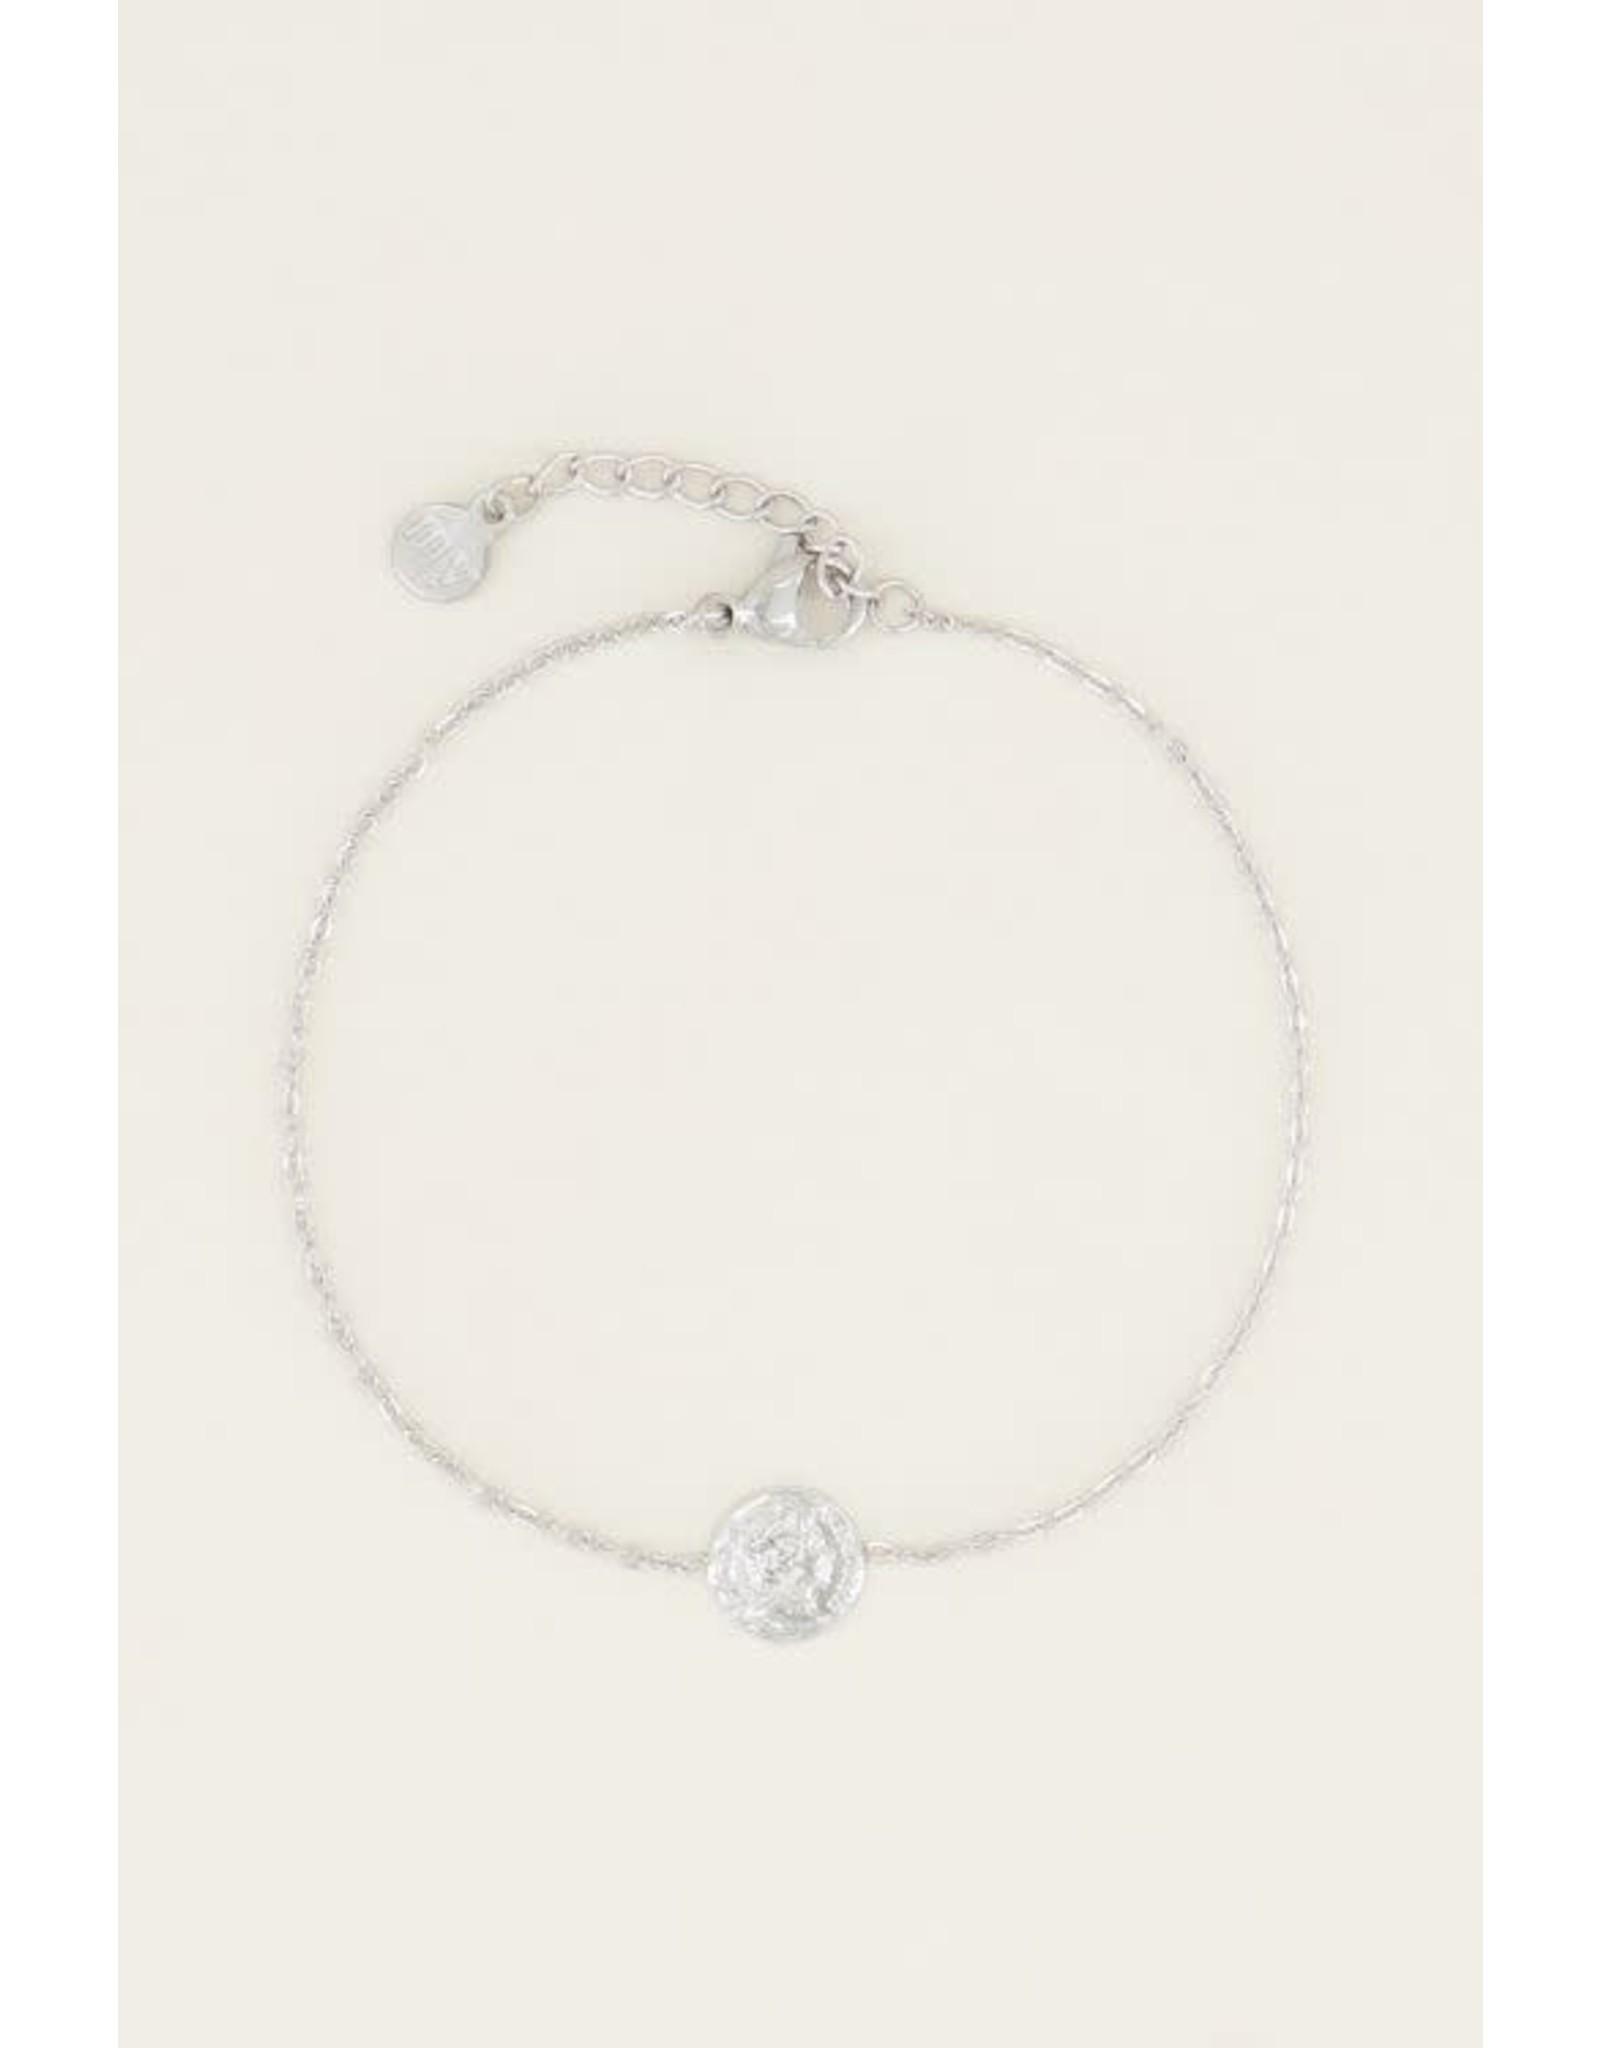 My Jewellery My Jewellery armband - munt